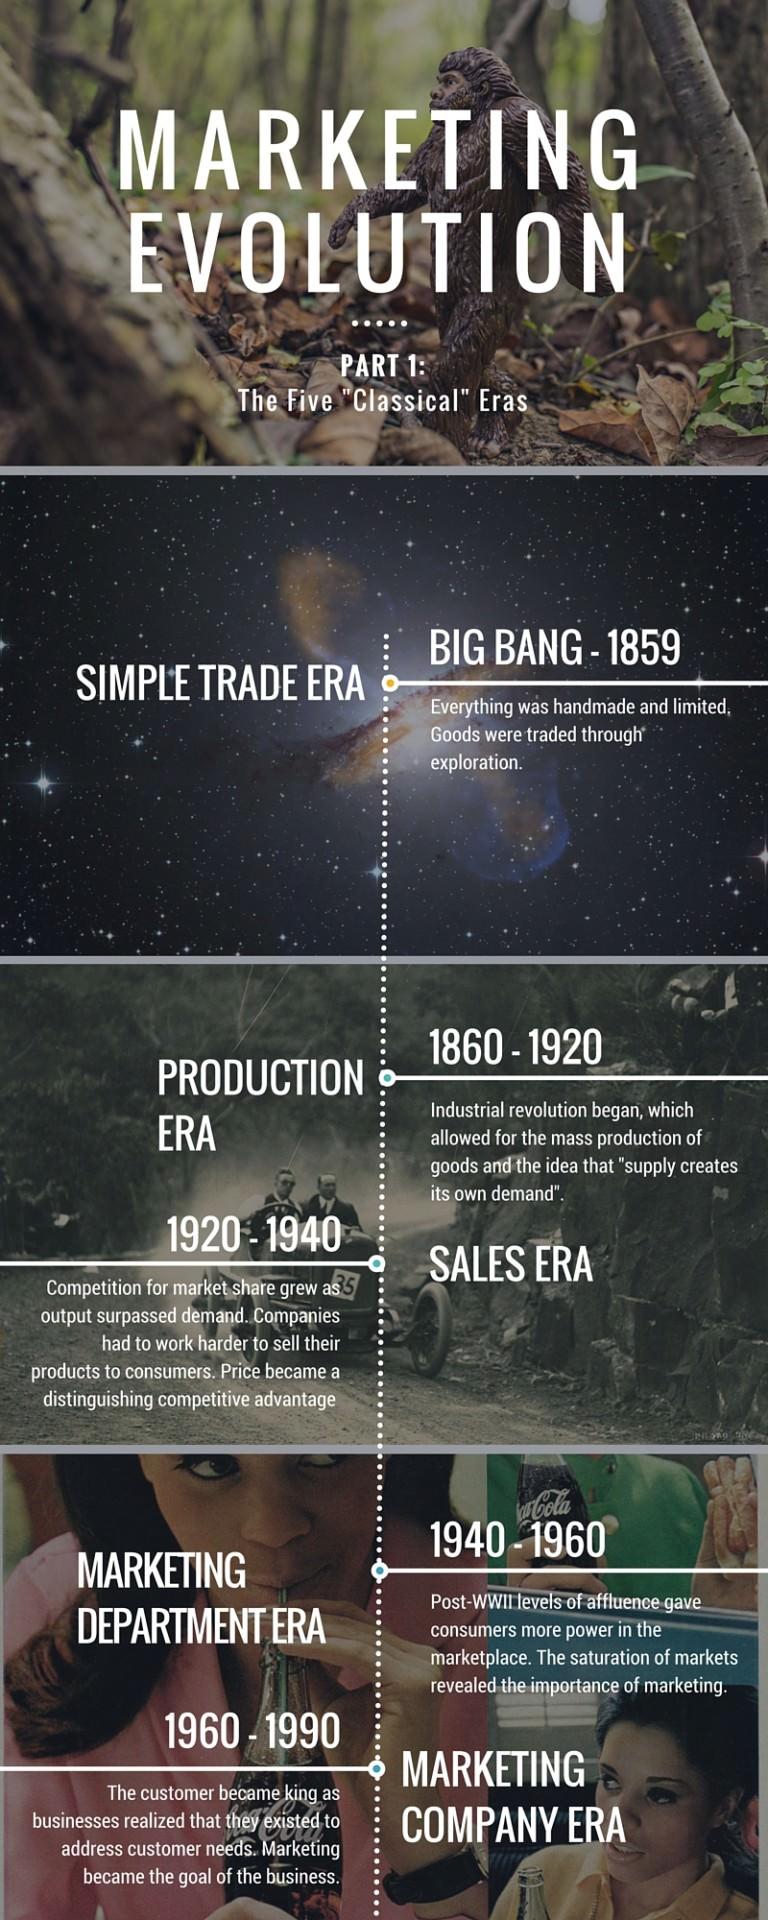 Marketing Evolution Version 2